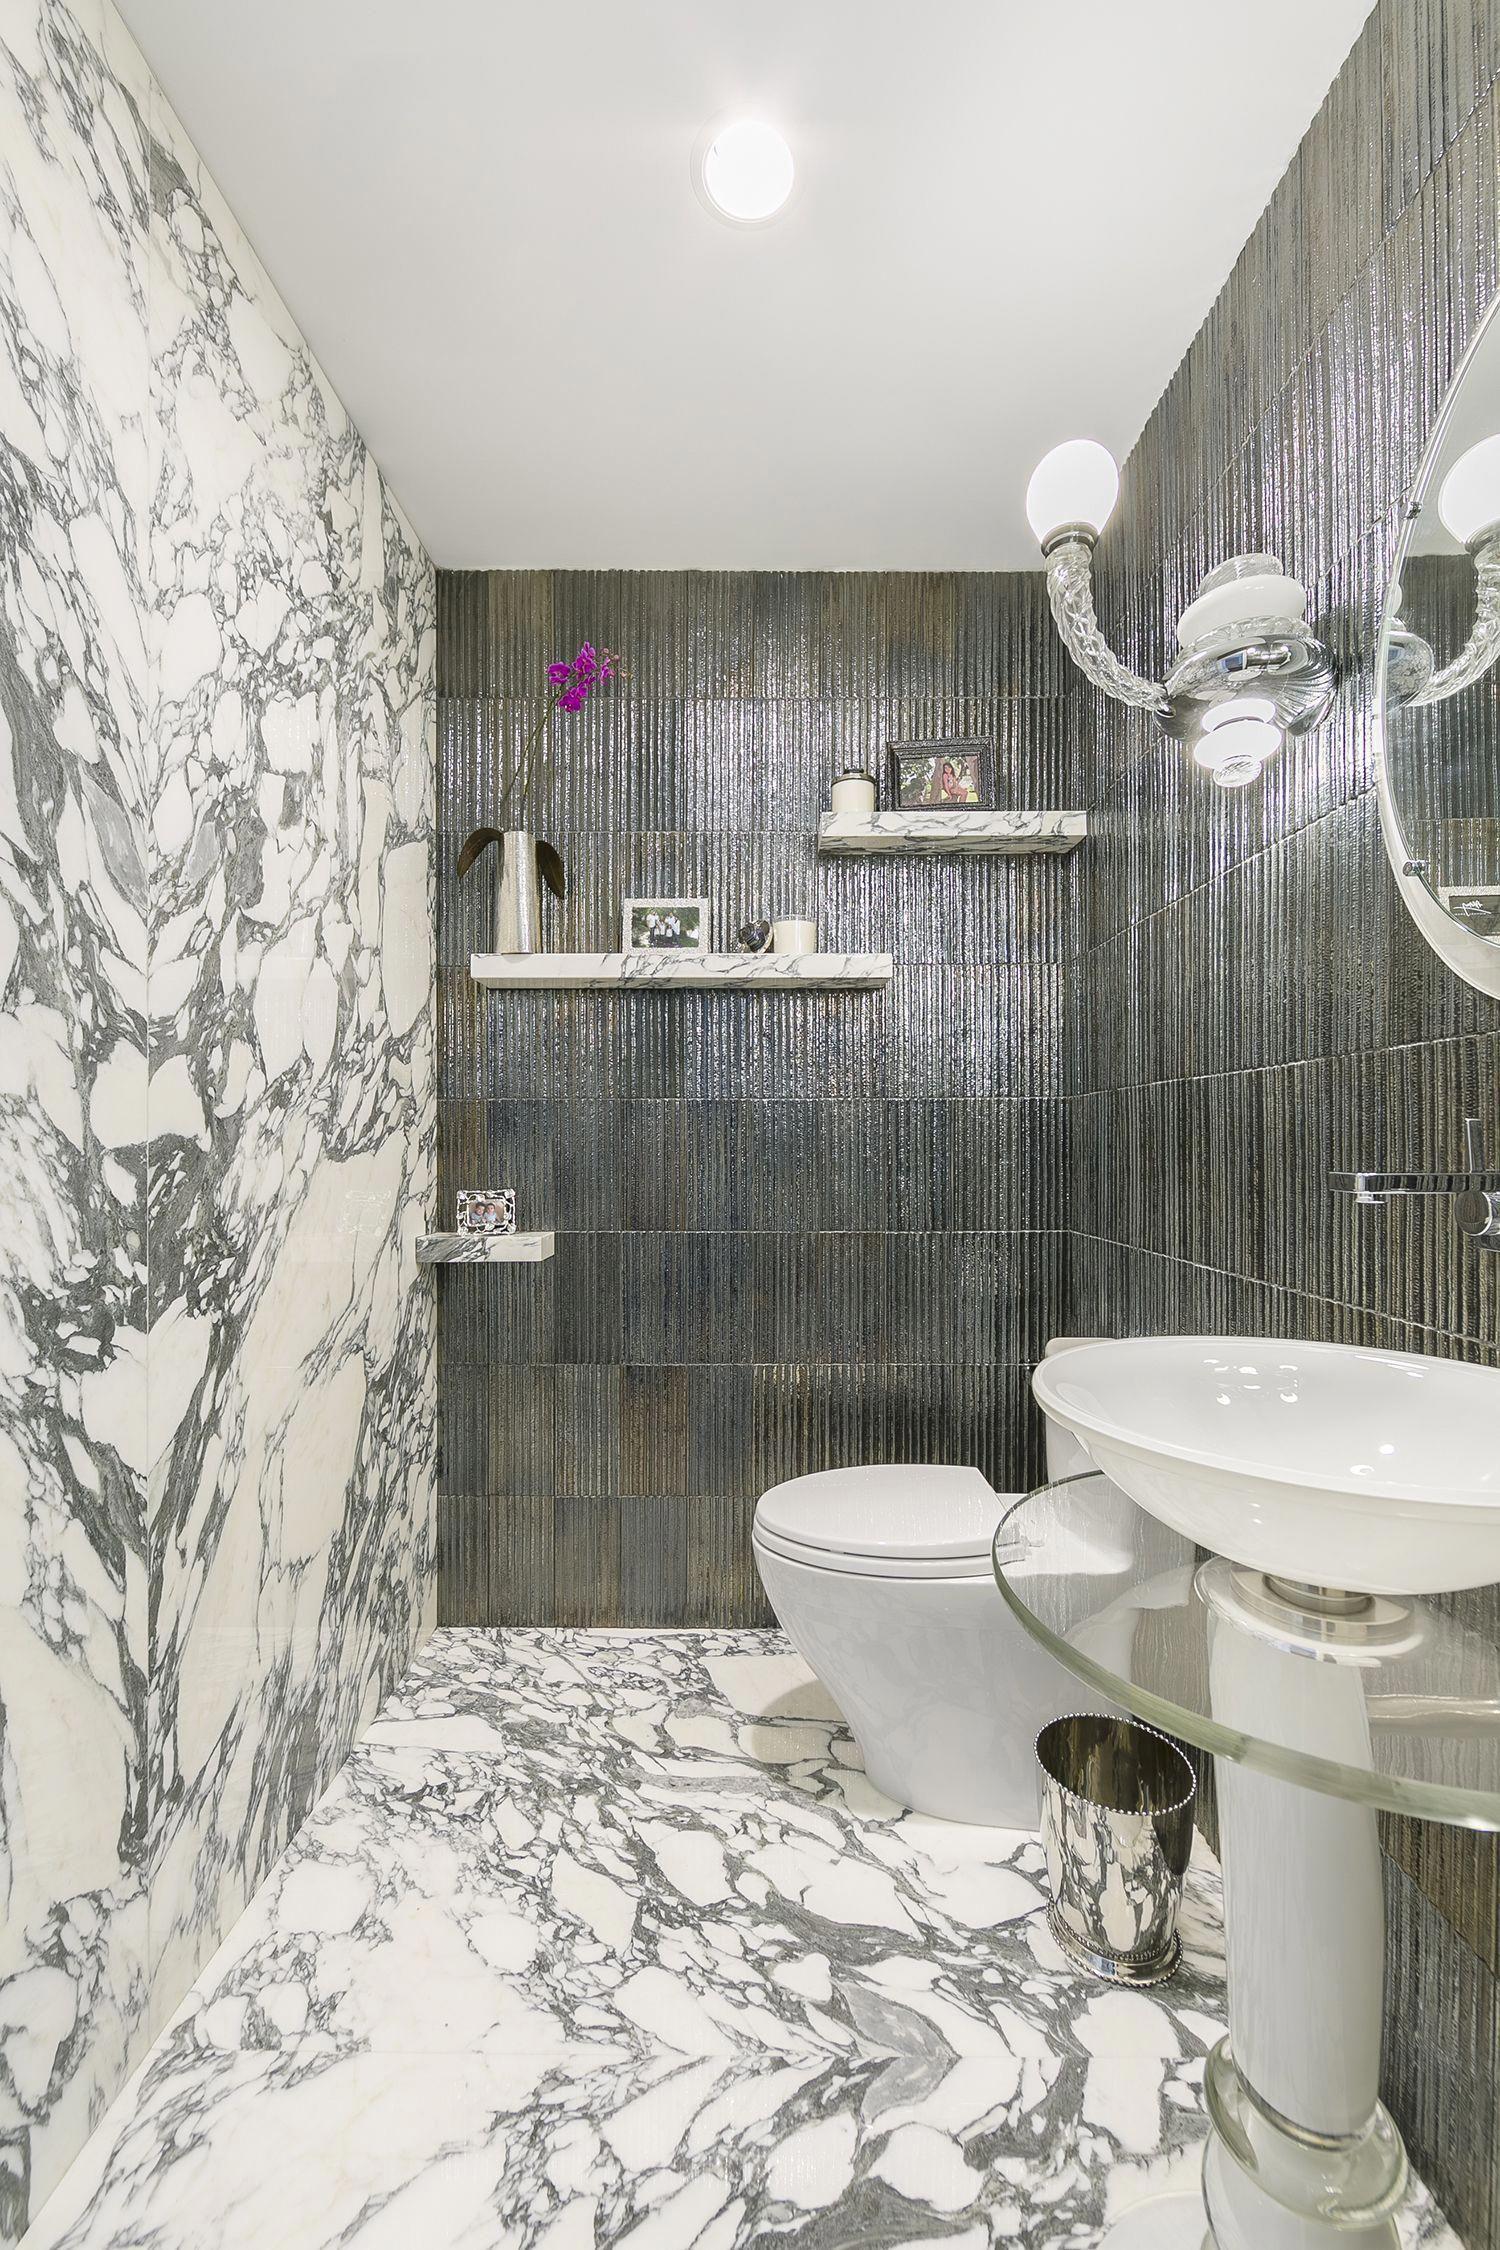 Artistic Tile Michael Aram Gotham Steel Walls With Arabescato Corchia Italian Marble Floor And Wal Italian Marble Flooring Green Marble Bathroom Marble Floor